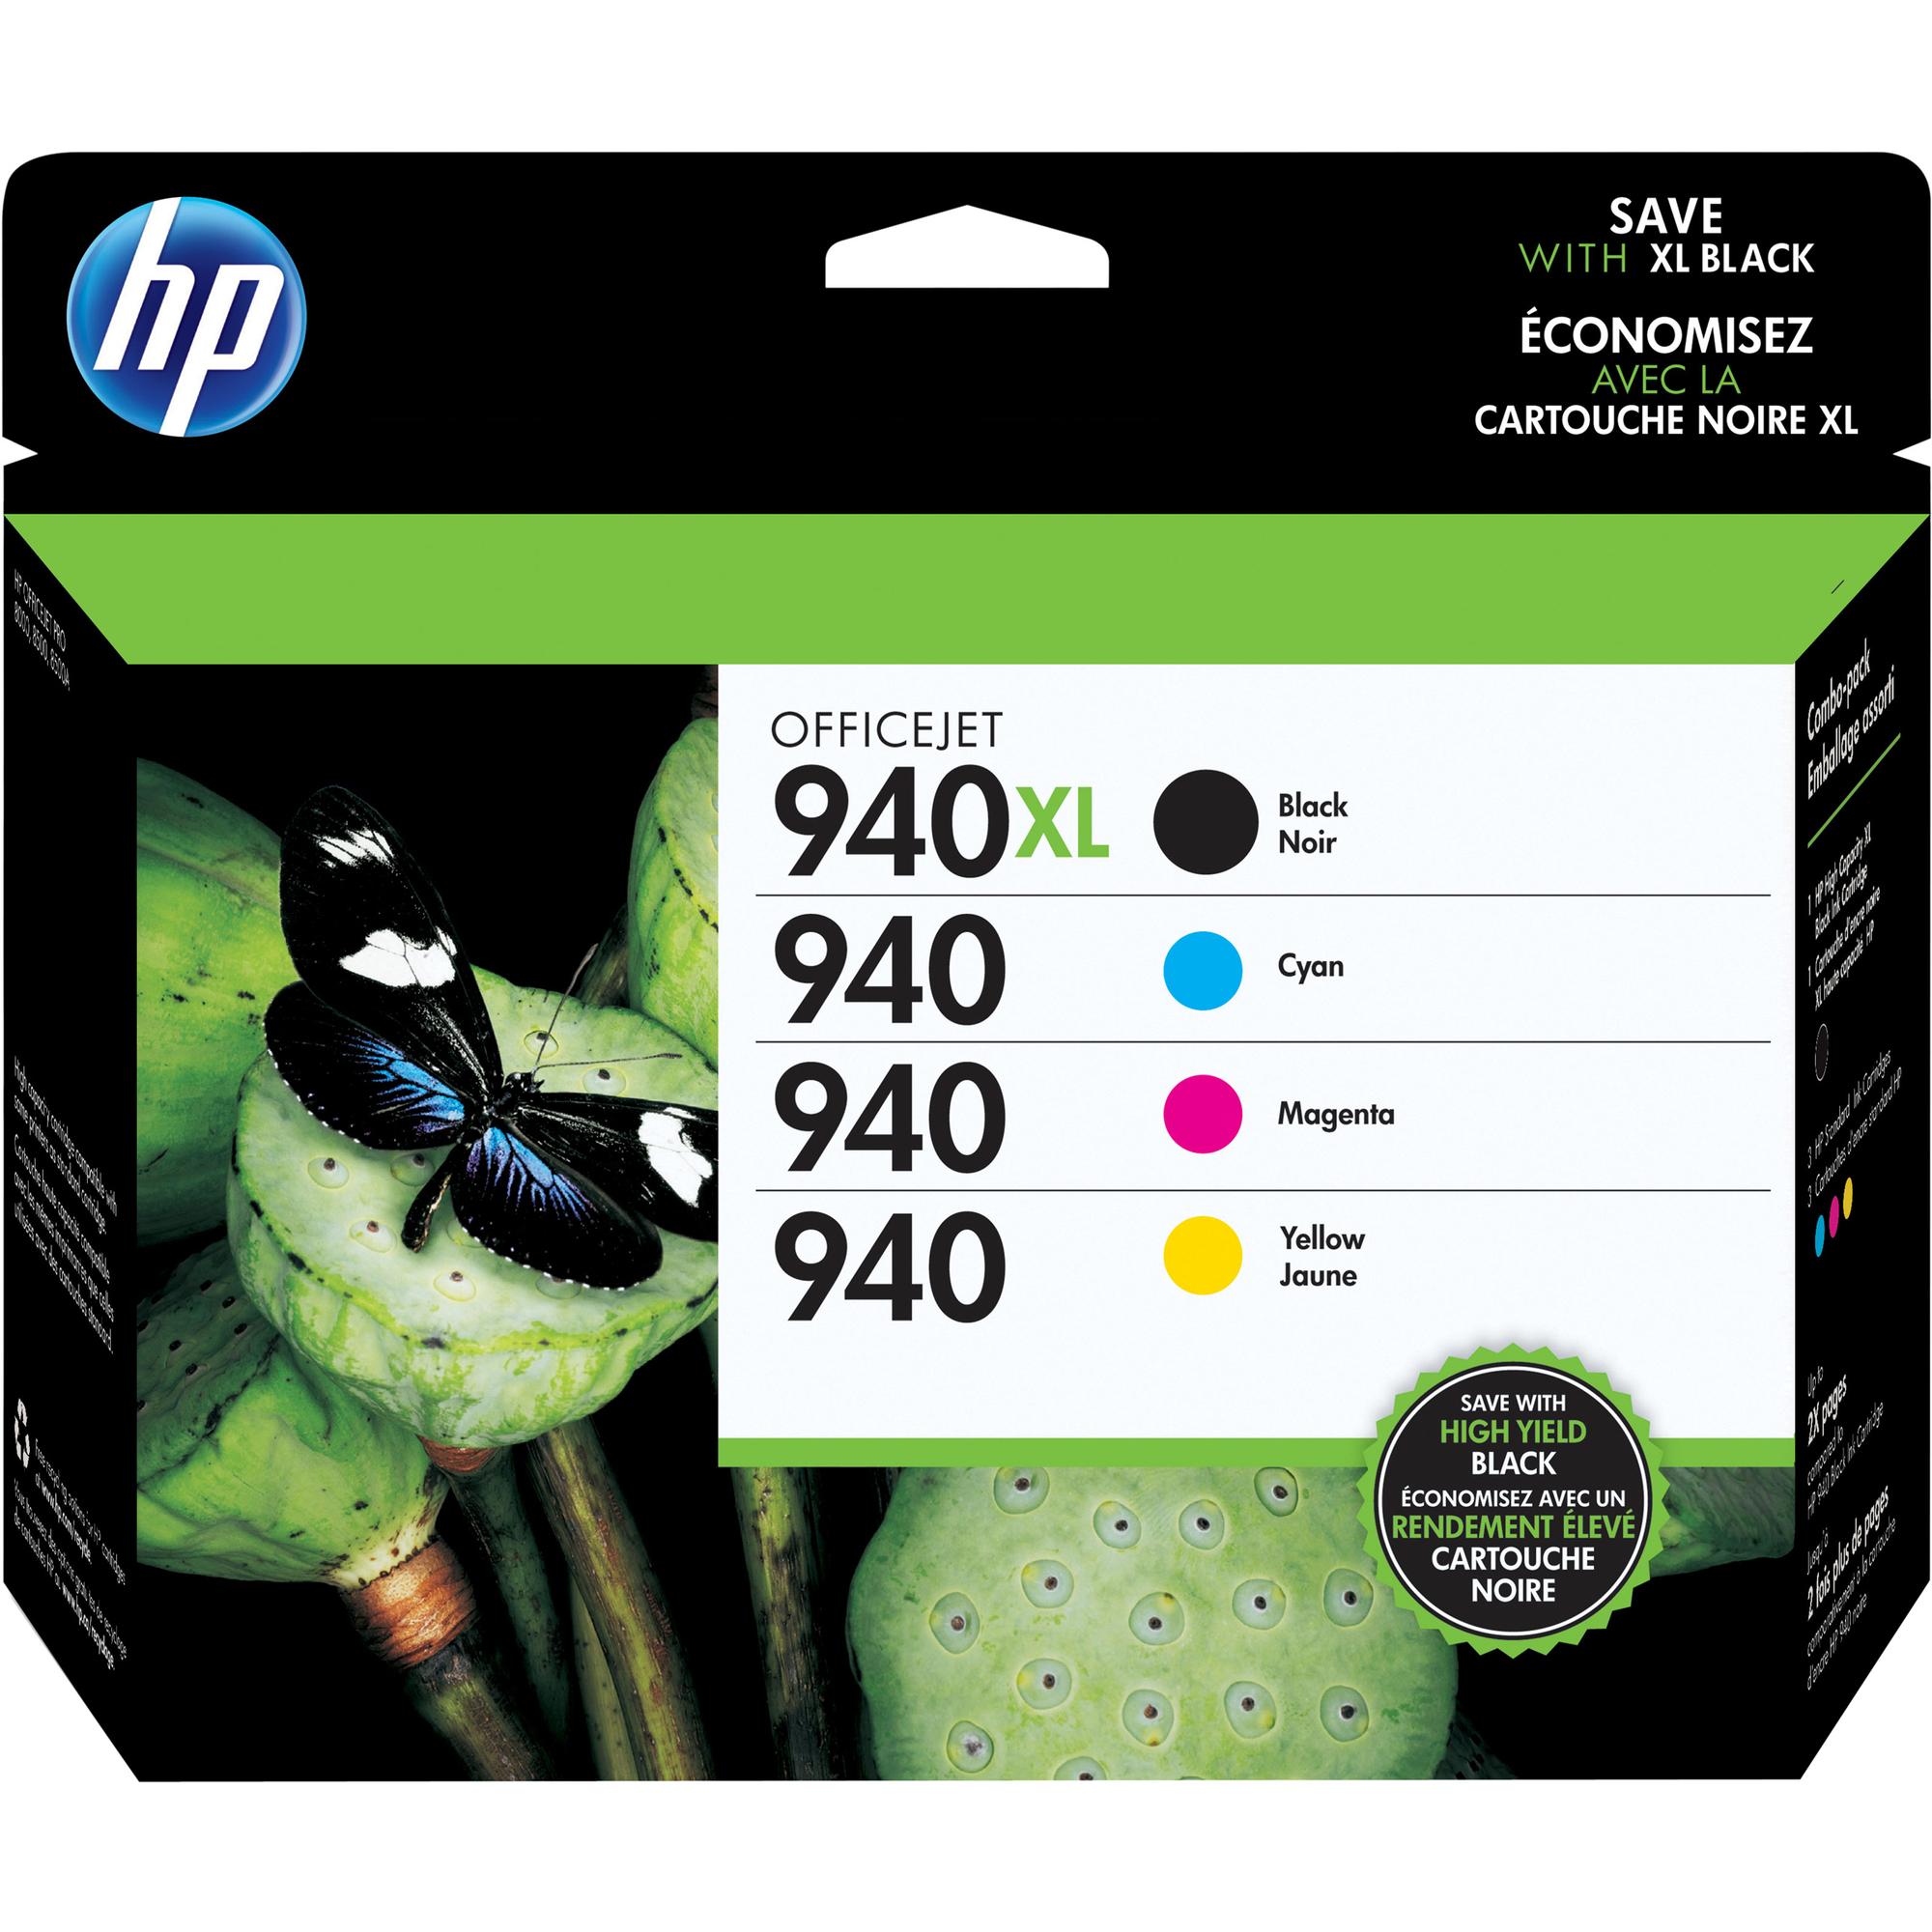 HP 940XL Ink Cartridge - Cyan, Magenta, Yellow, Black